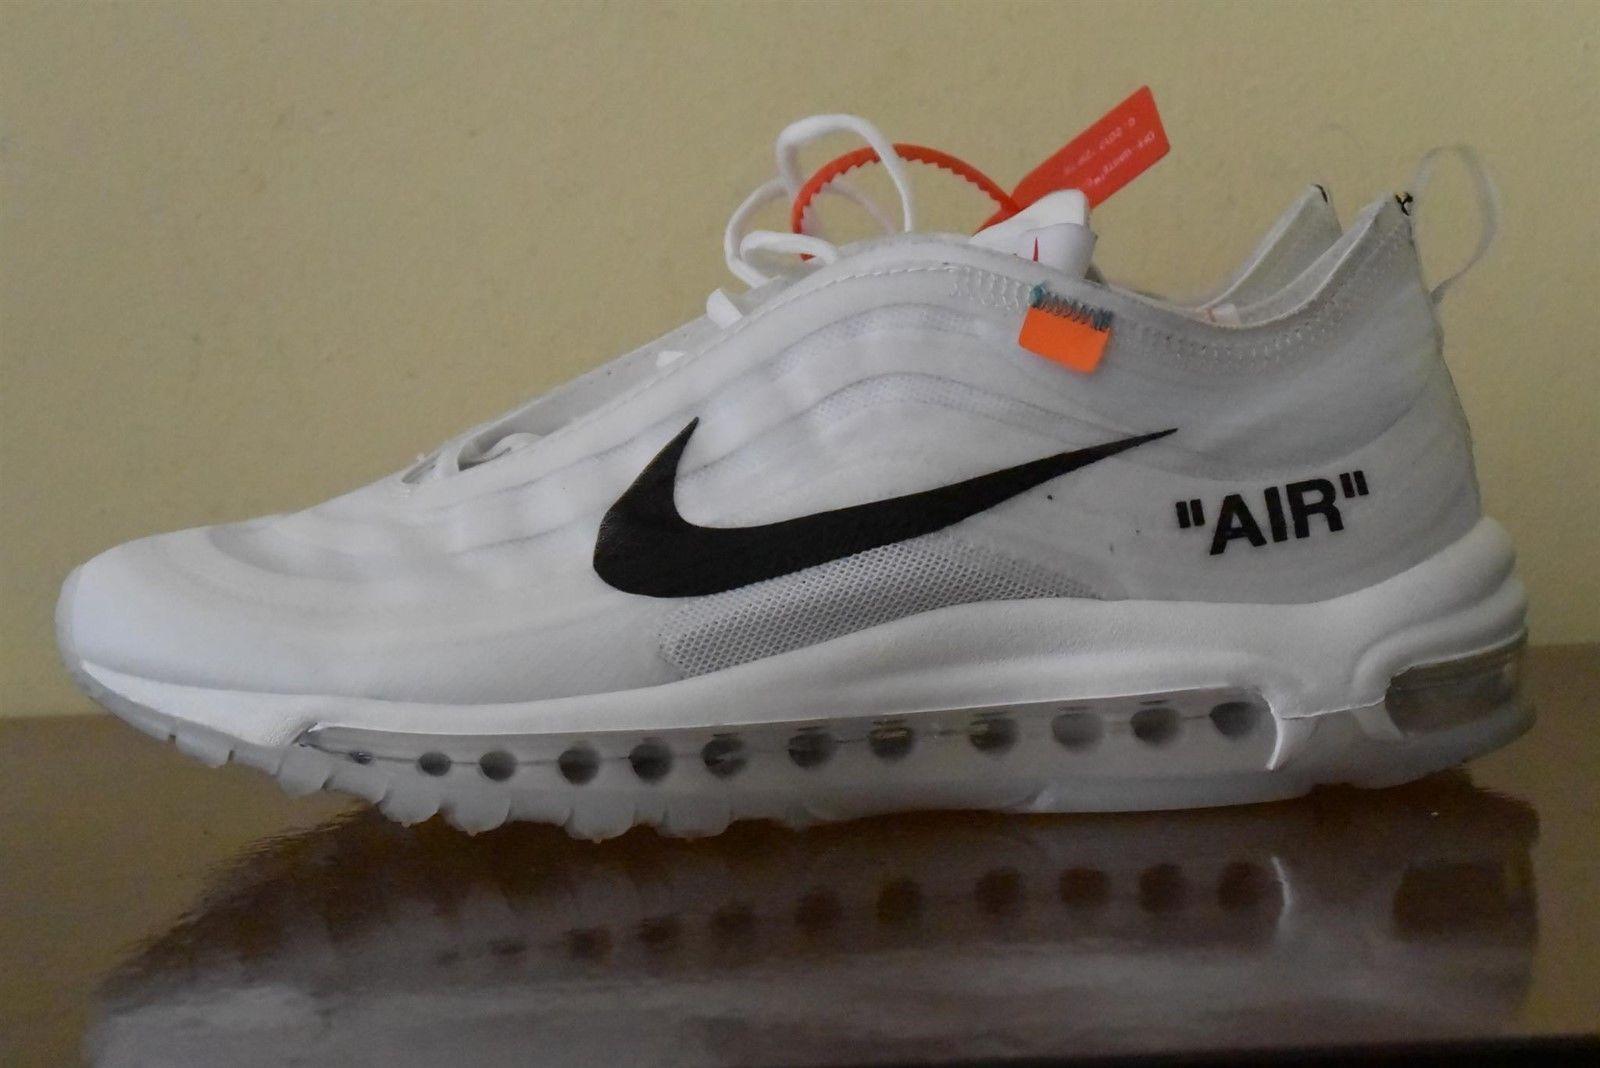 Nike Air Max 97 OG OFF-WHITE AJ4585-100 Sz 10